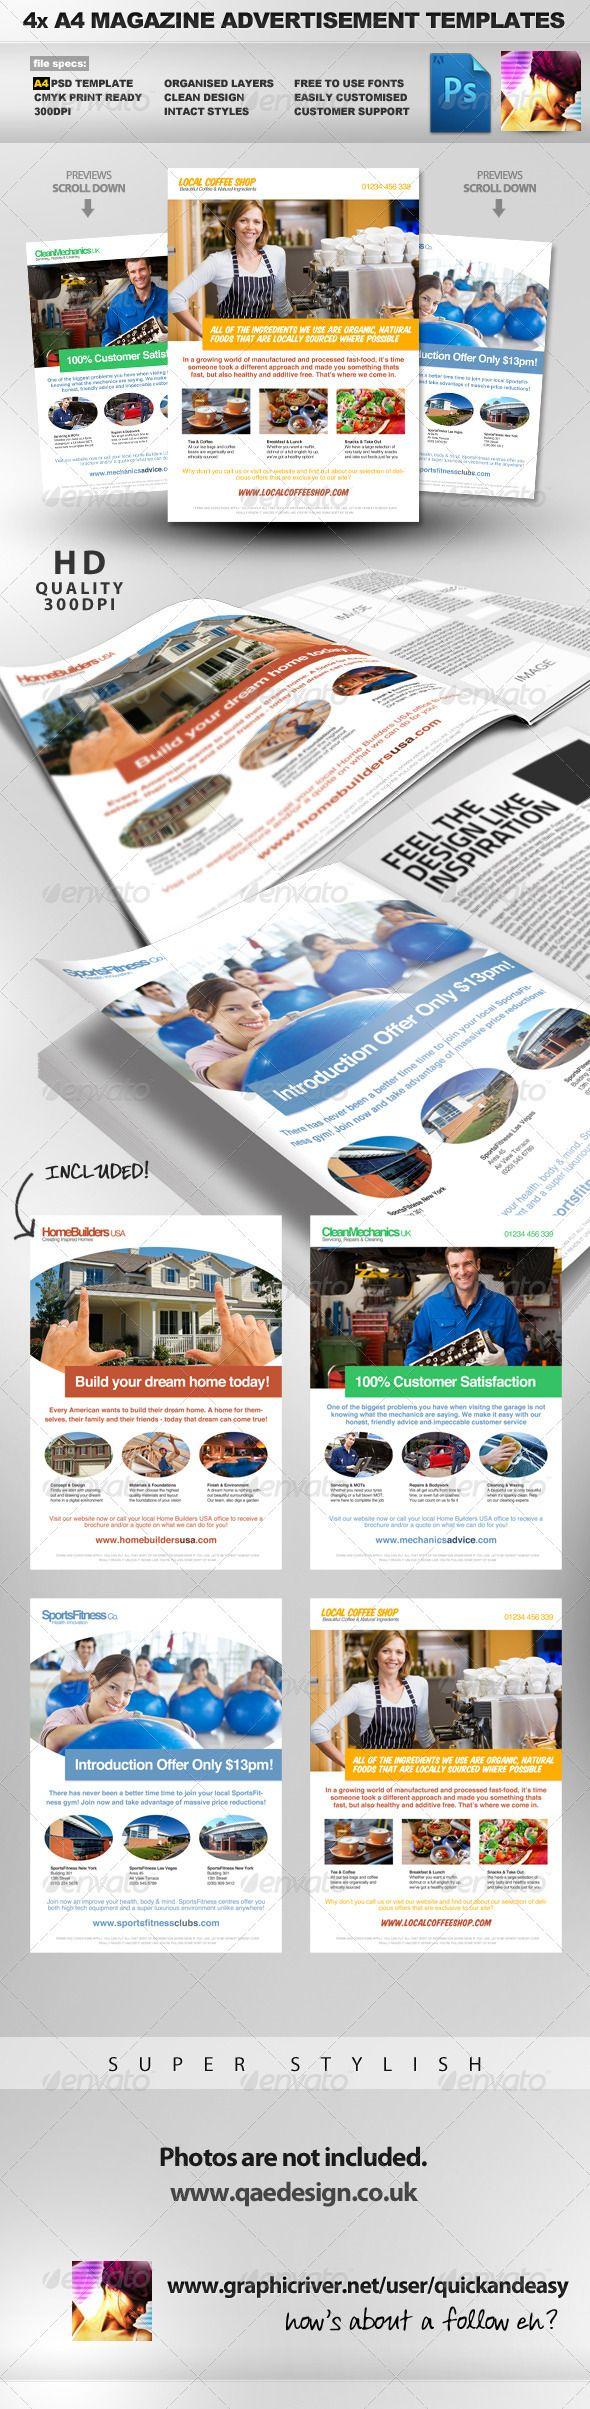 best images about print templates fonts 4x clean magazine advertisement templates